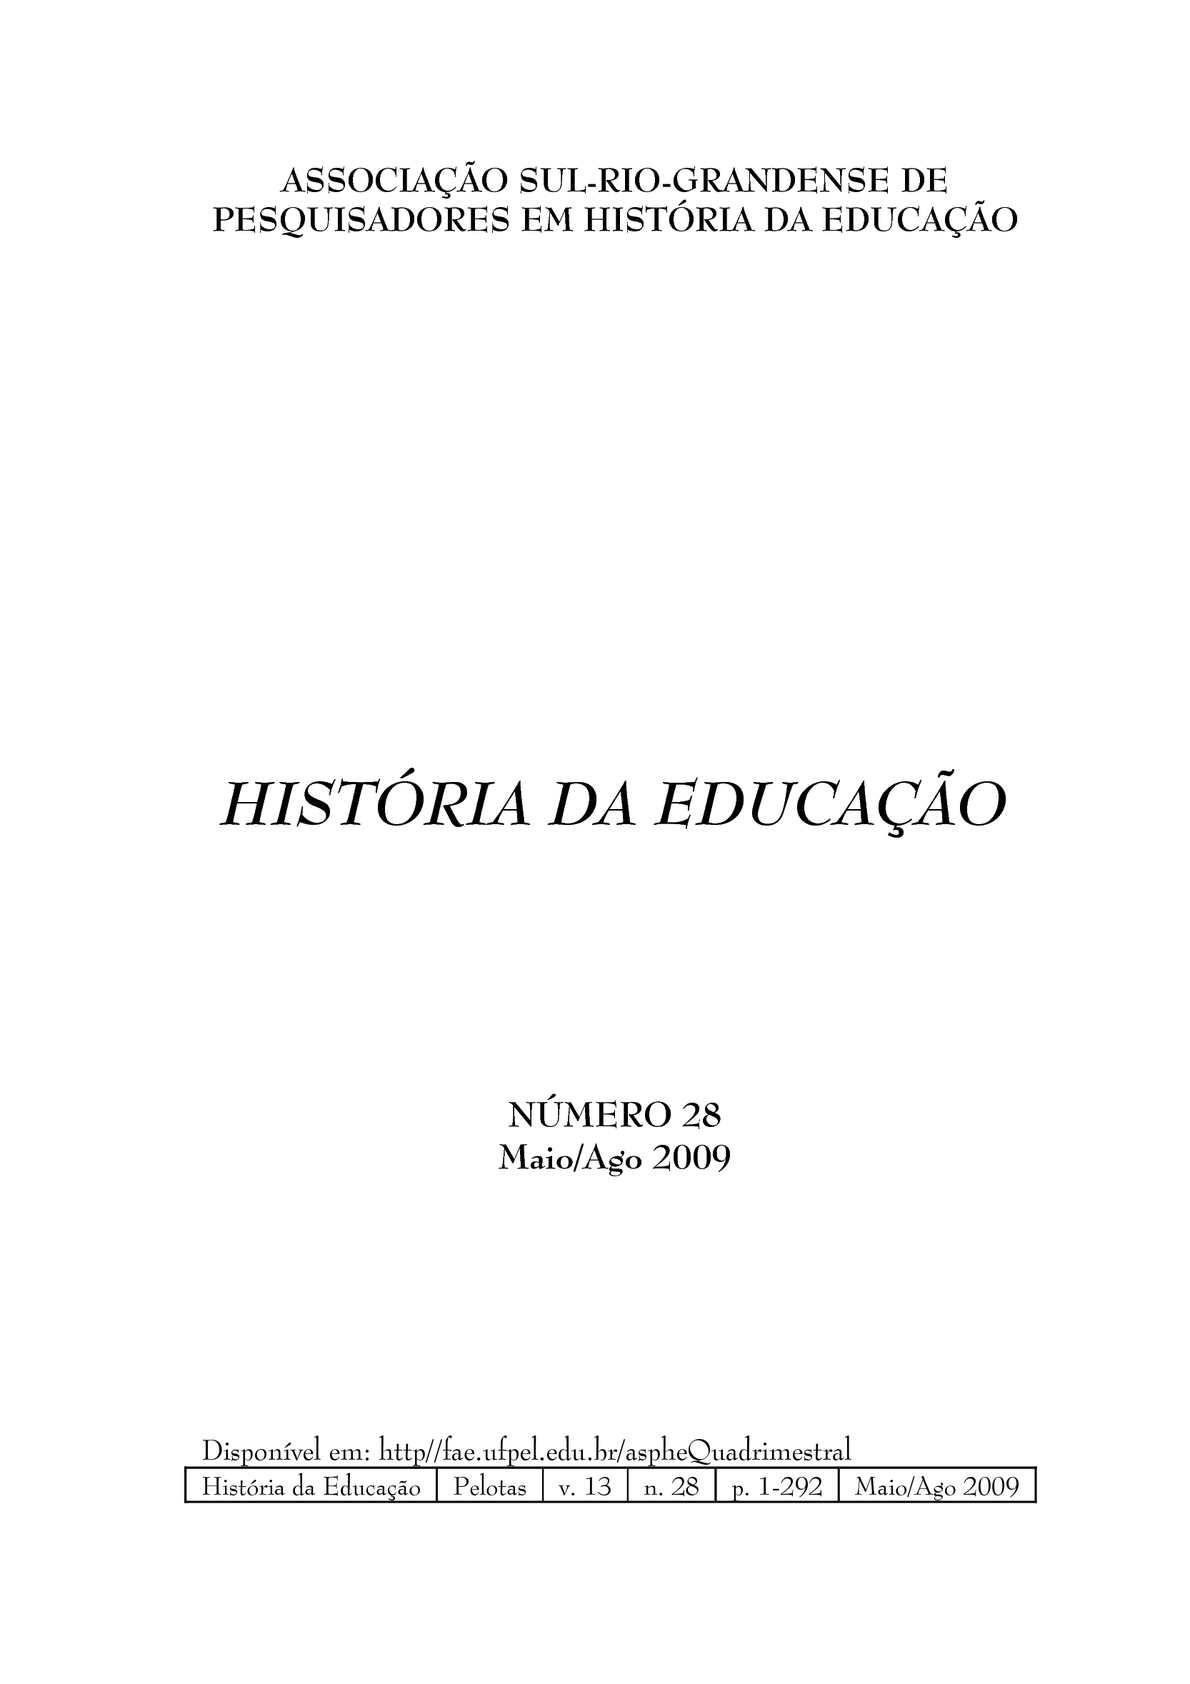 Calamo histria da educao rhe n 28 fandeluxe Image collections